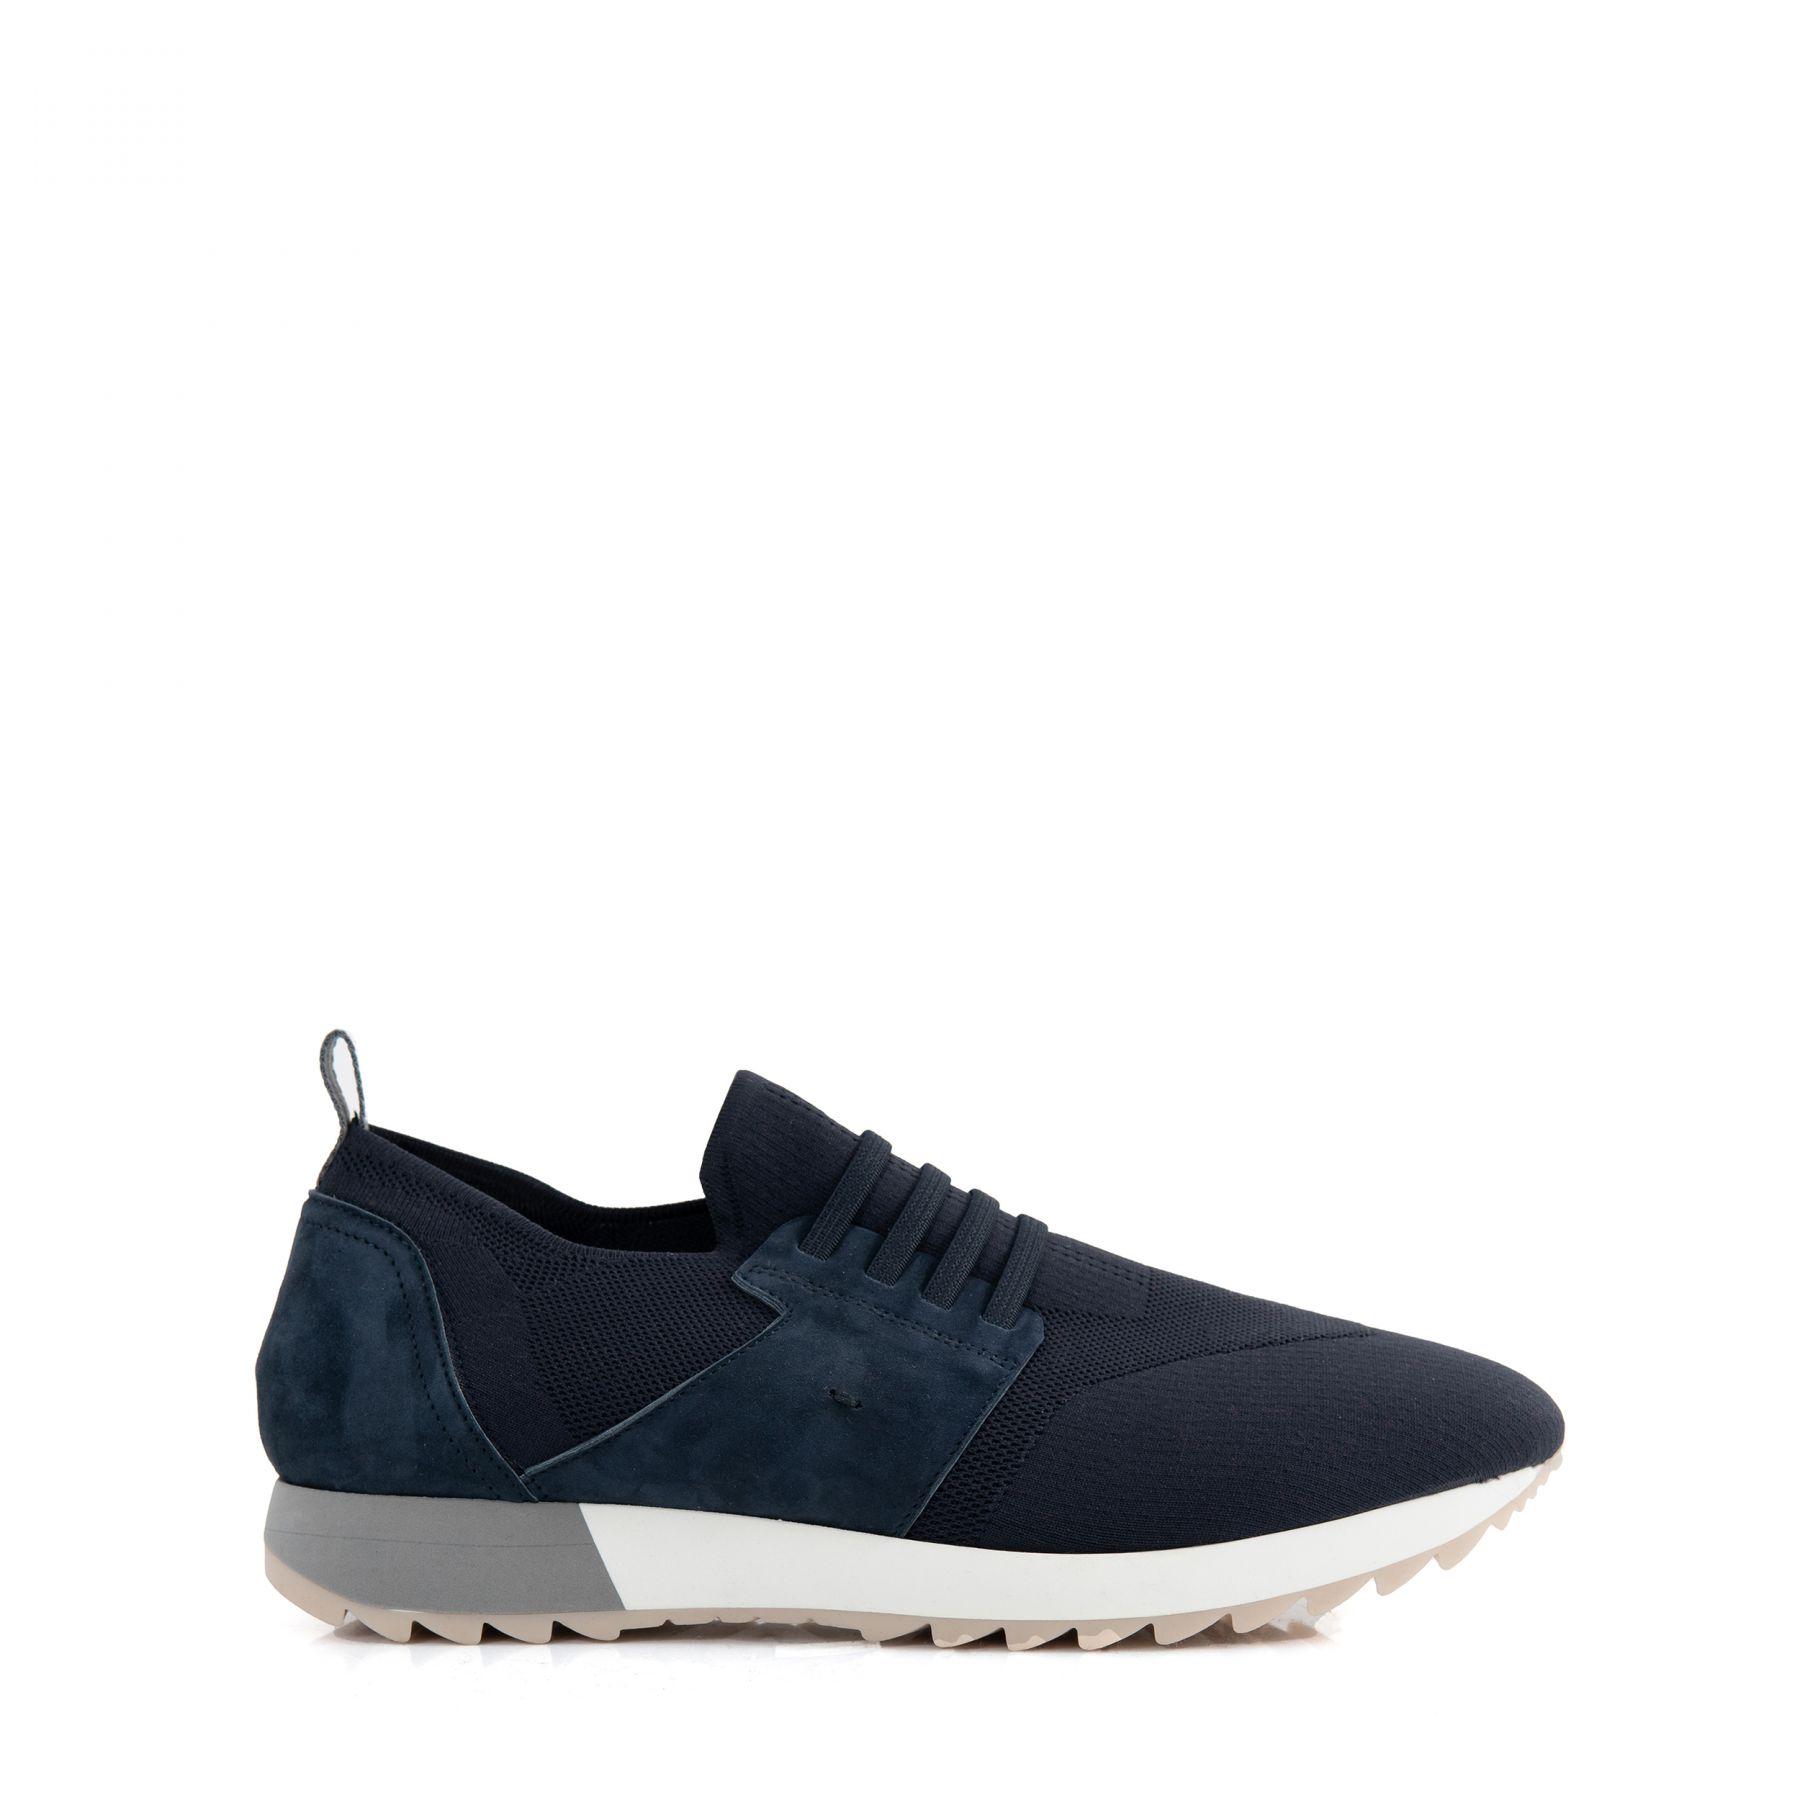 Кроссовки Andrea Ventura темно-синие